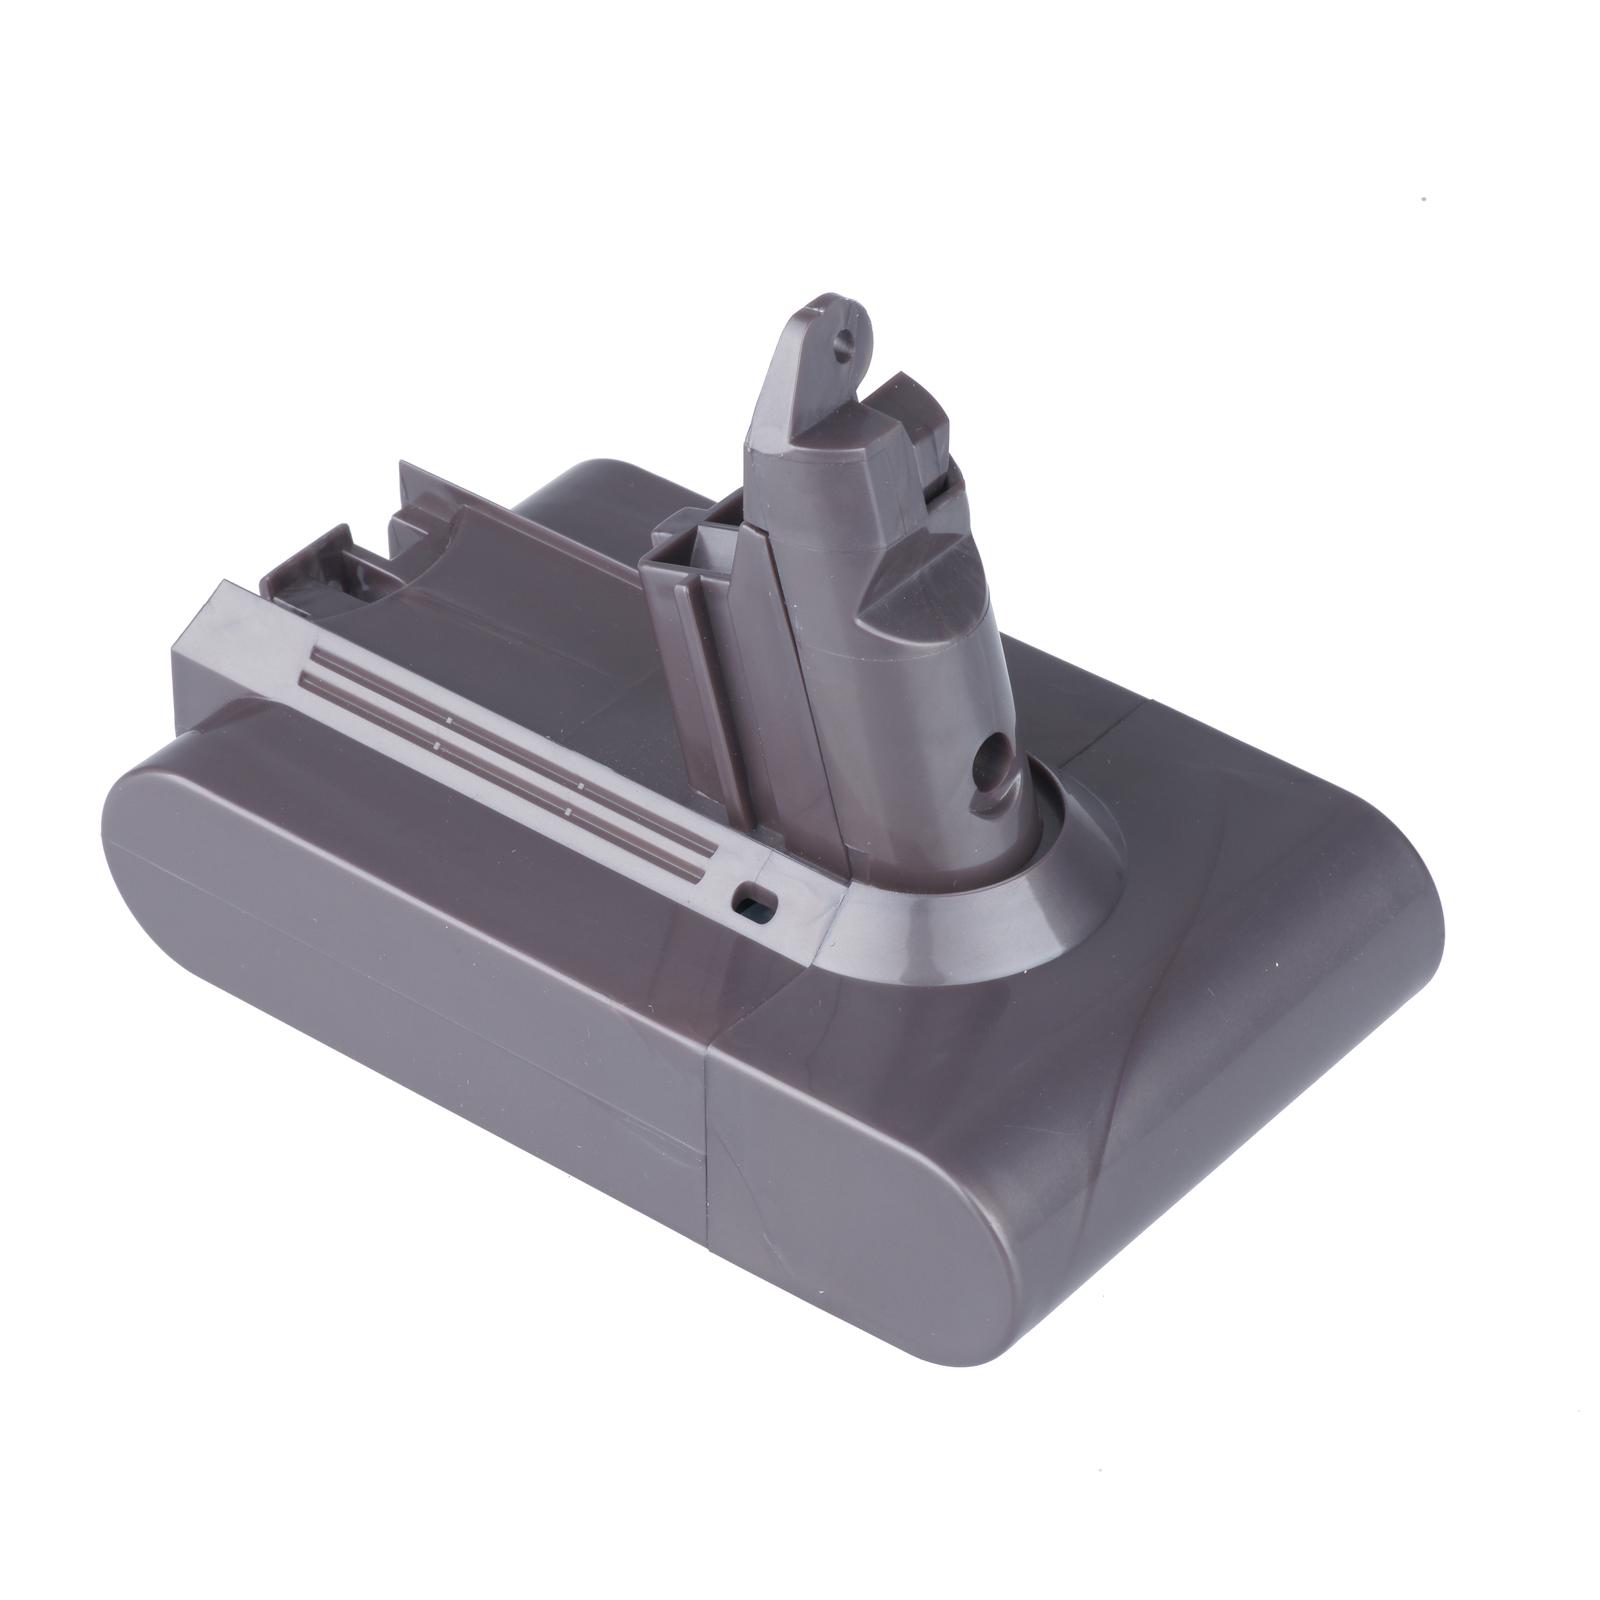 For Dyson V6 Animal Battery Dc58 Dc59 Dc61 Dc62 Dc72 Dc74